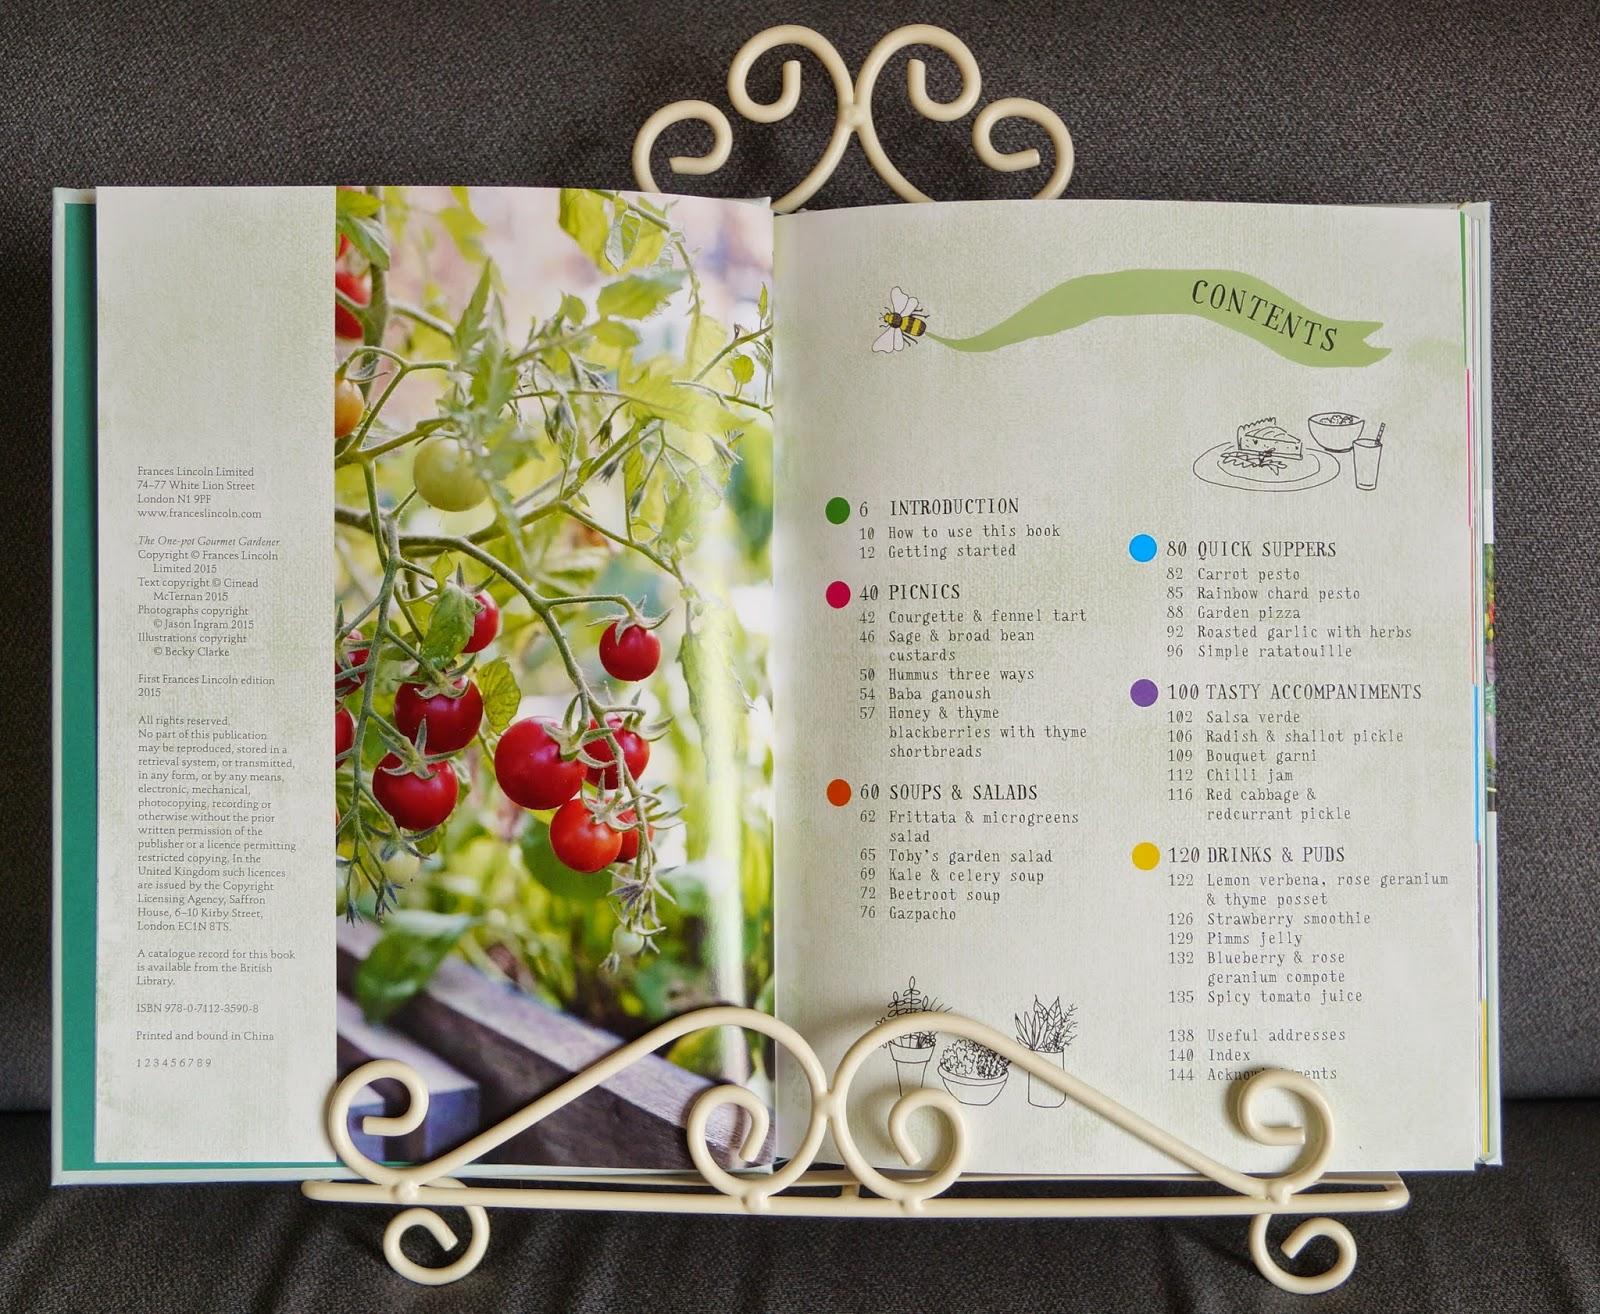 'the one-pot gourmet gardener' book (2) ~ growourown.blogspot.com